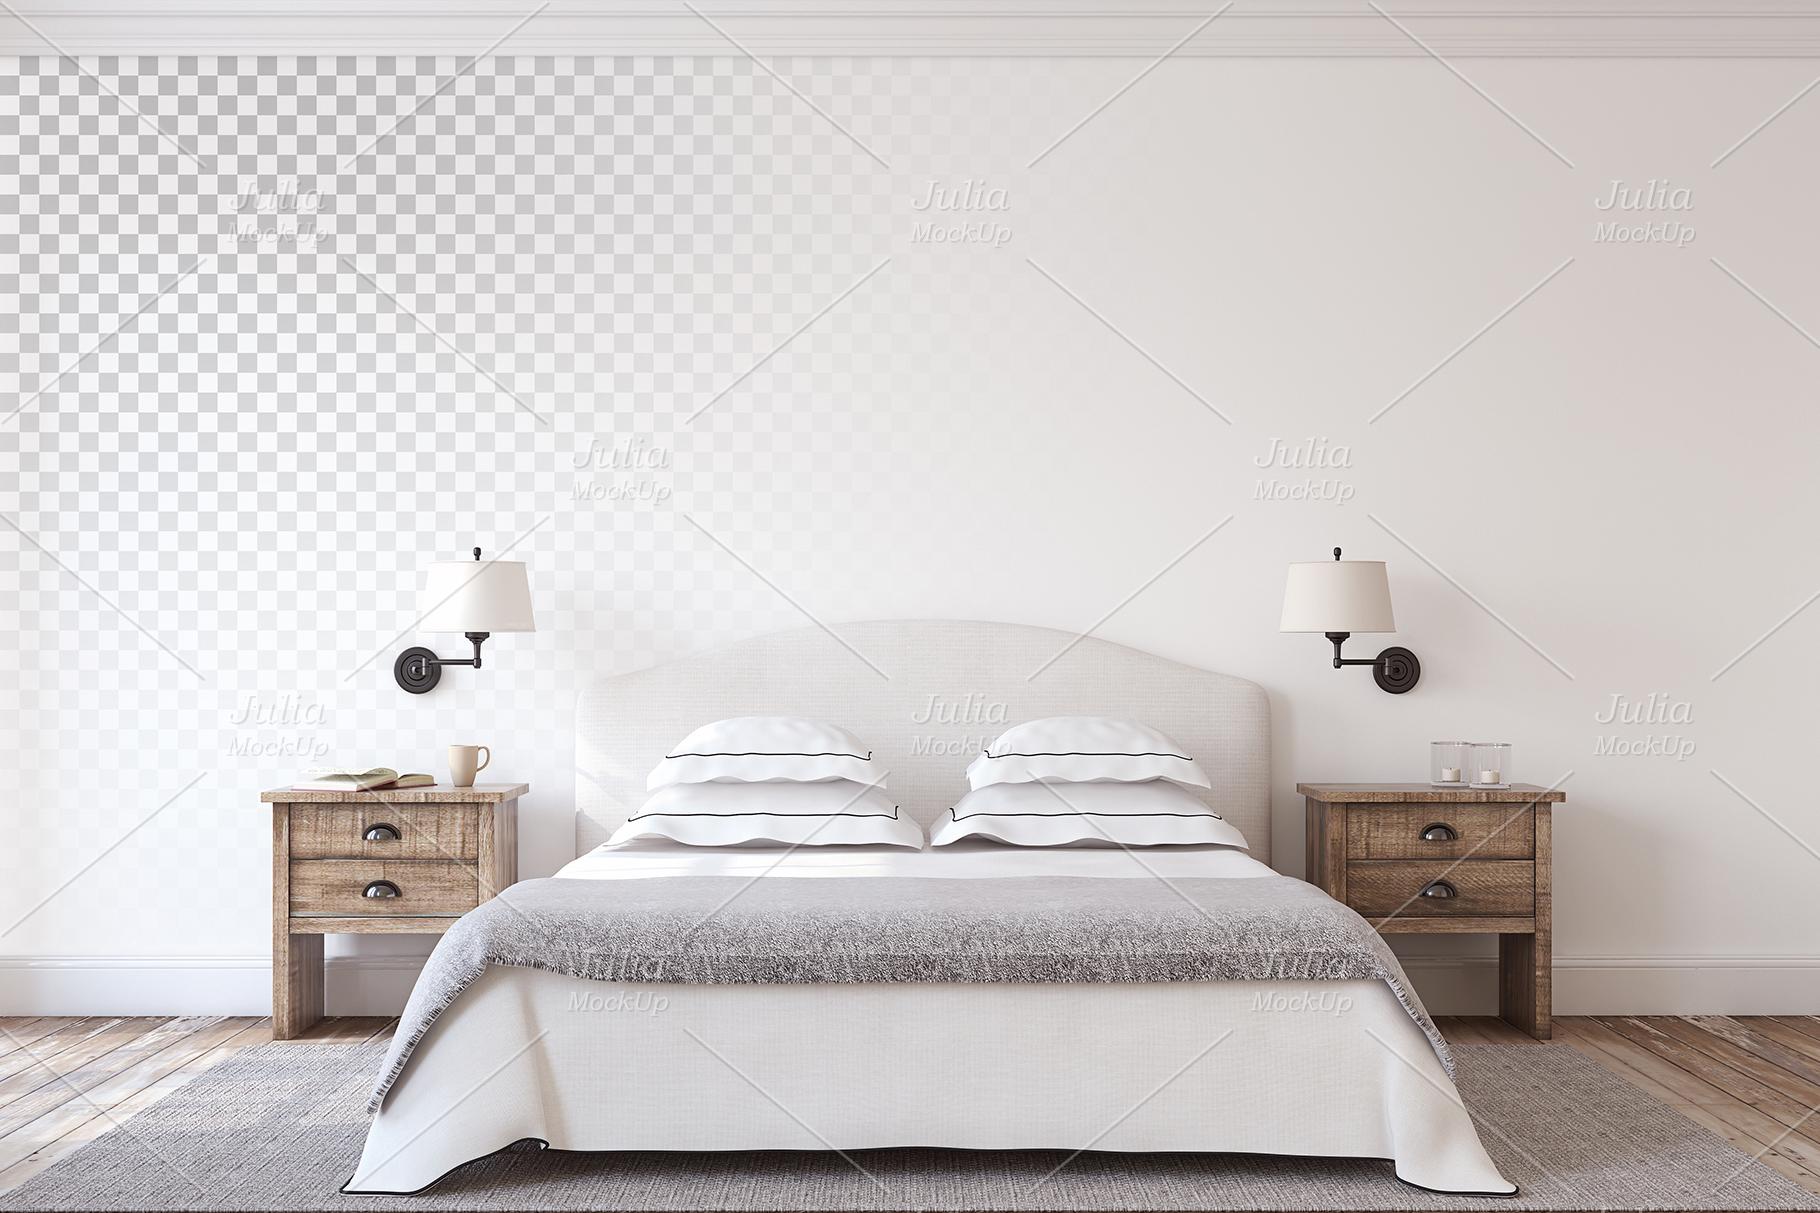 Farmhouse Style. Wall&Frames Mockup. example image 2